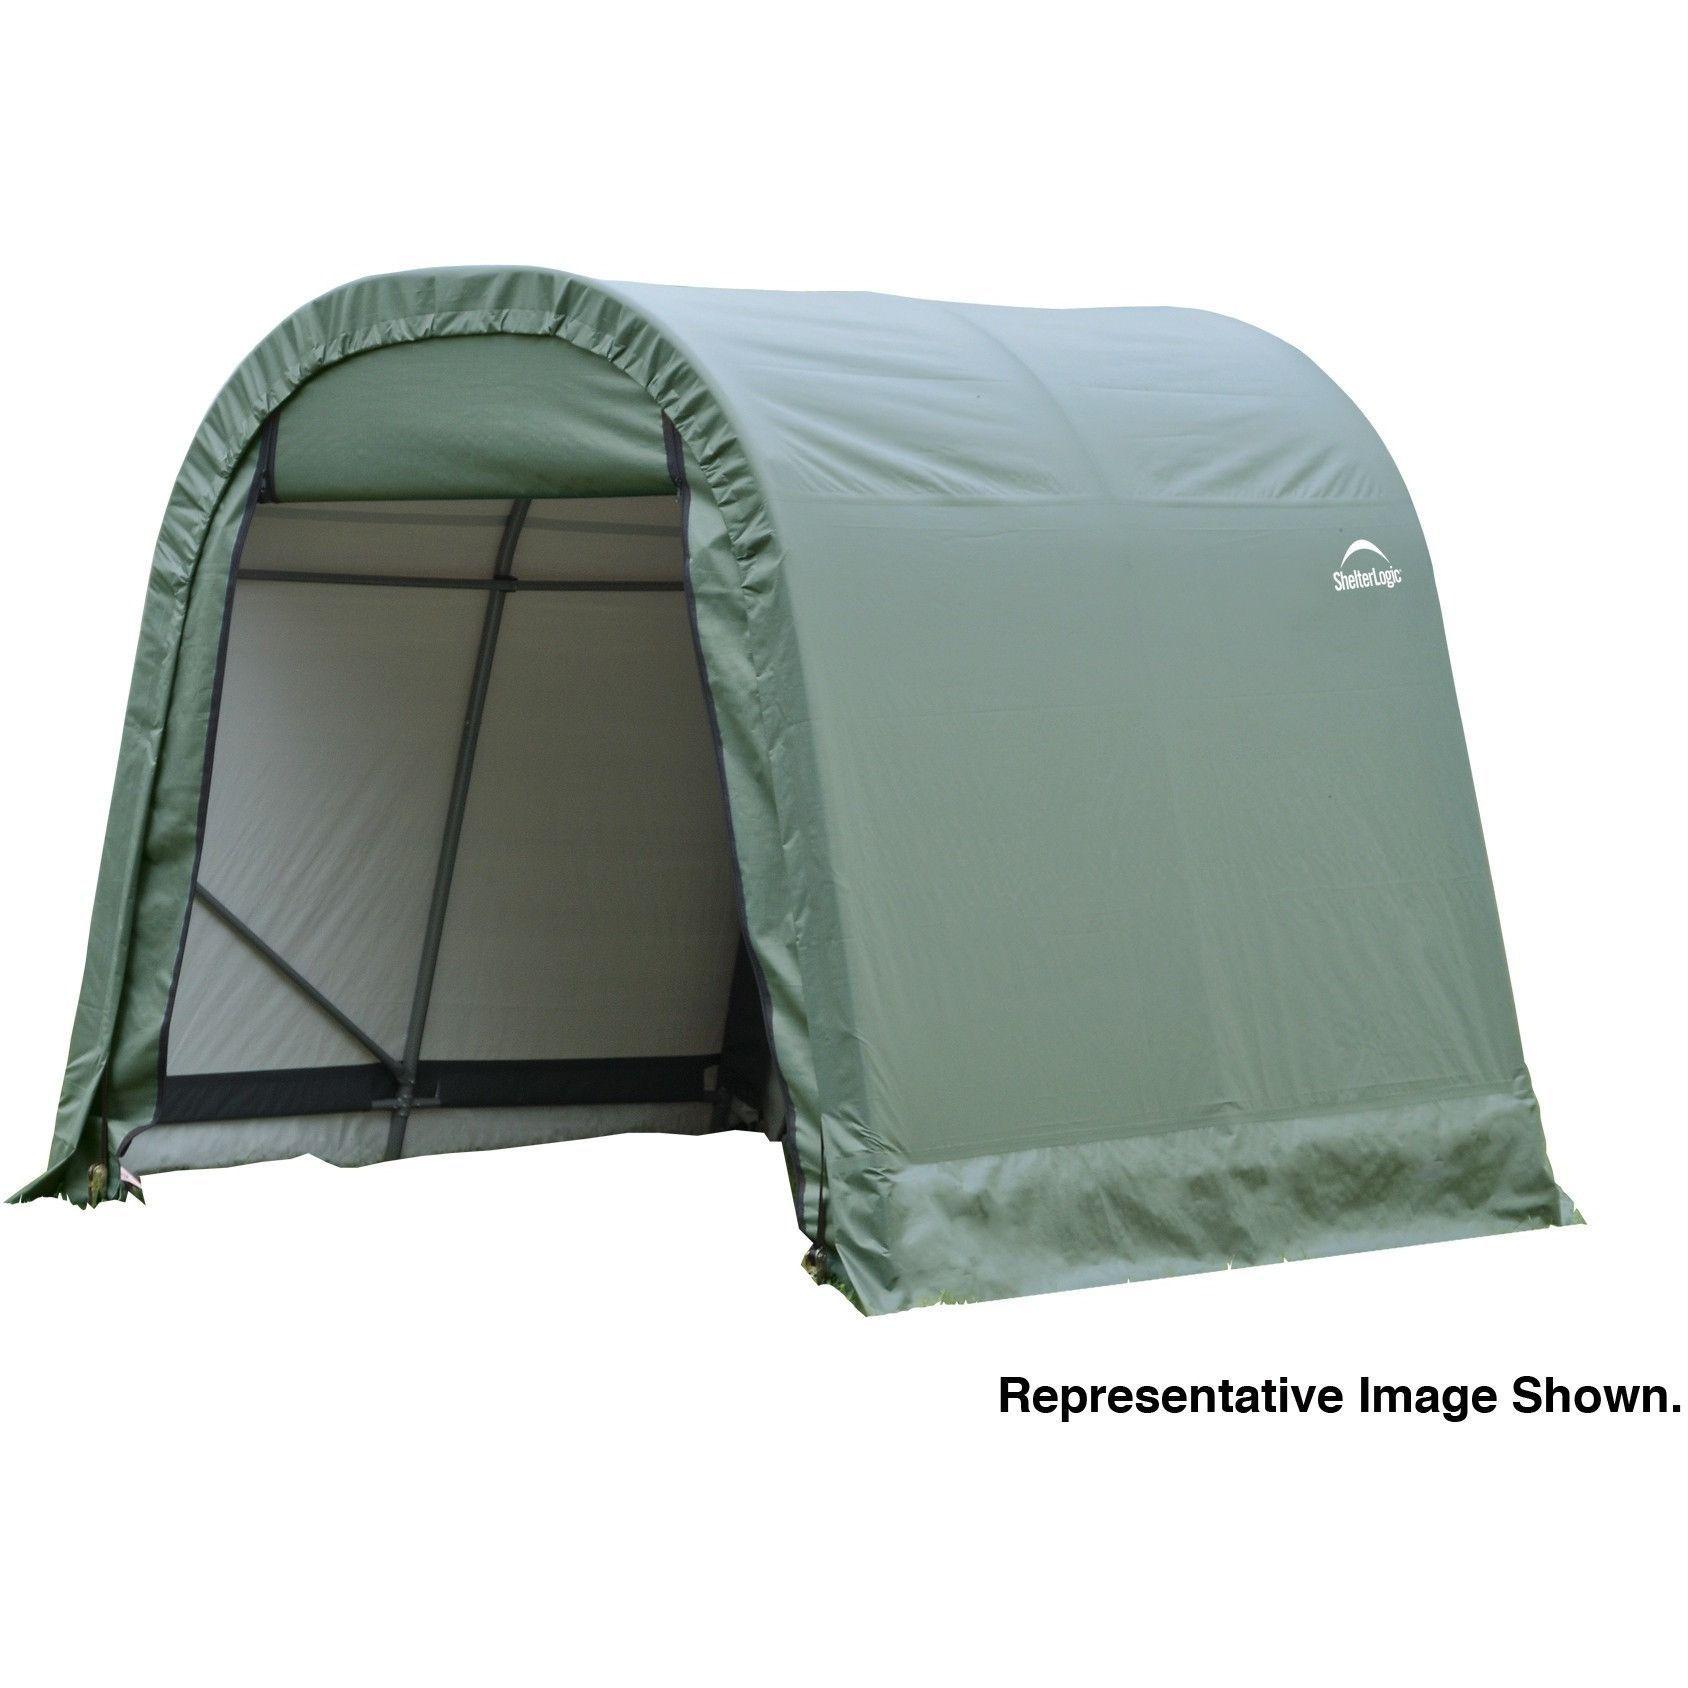 ShelterLogic GREEN SHELTERCOAT ROUND STD 8 X 16 X 8 76824